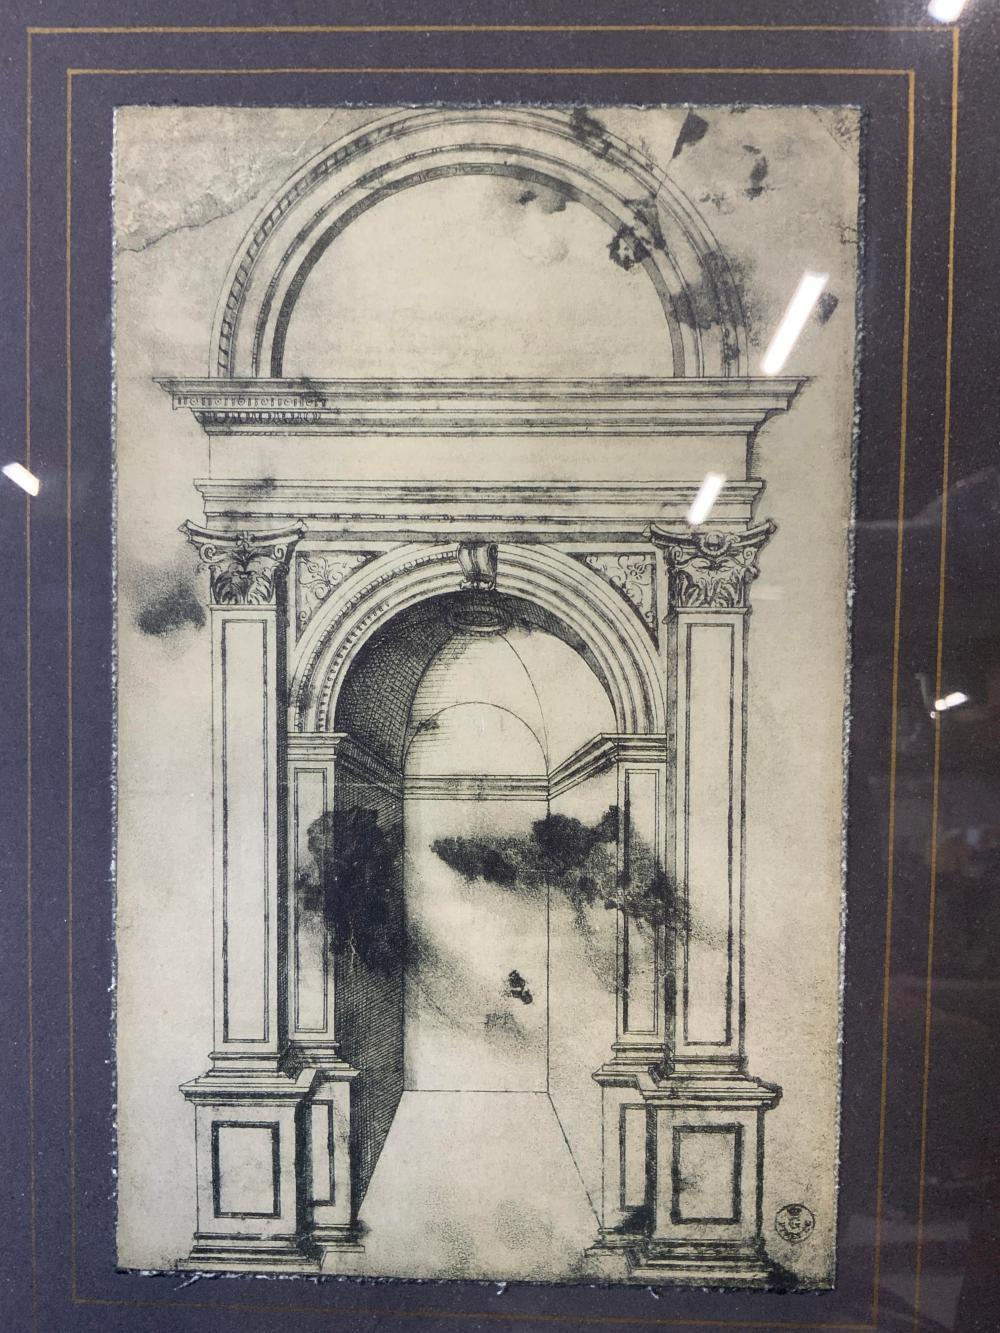 Triumphal Arch Lithograph